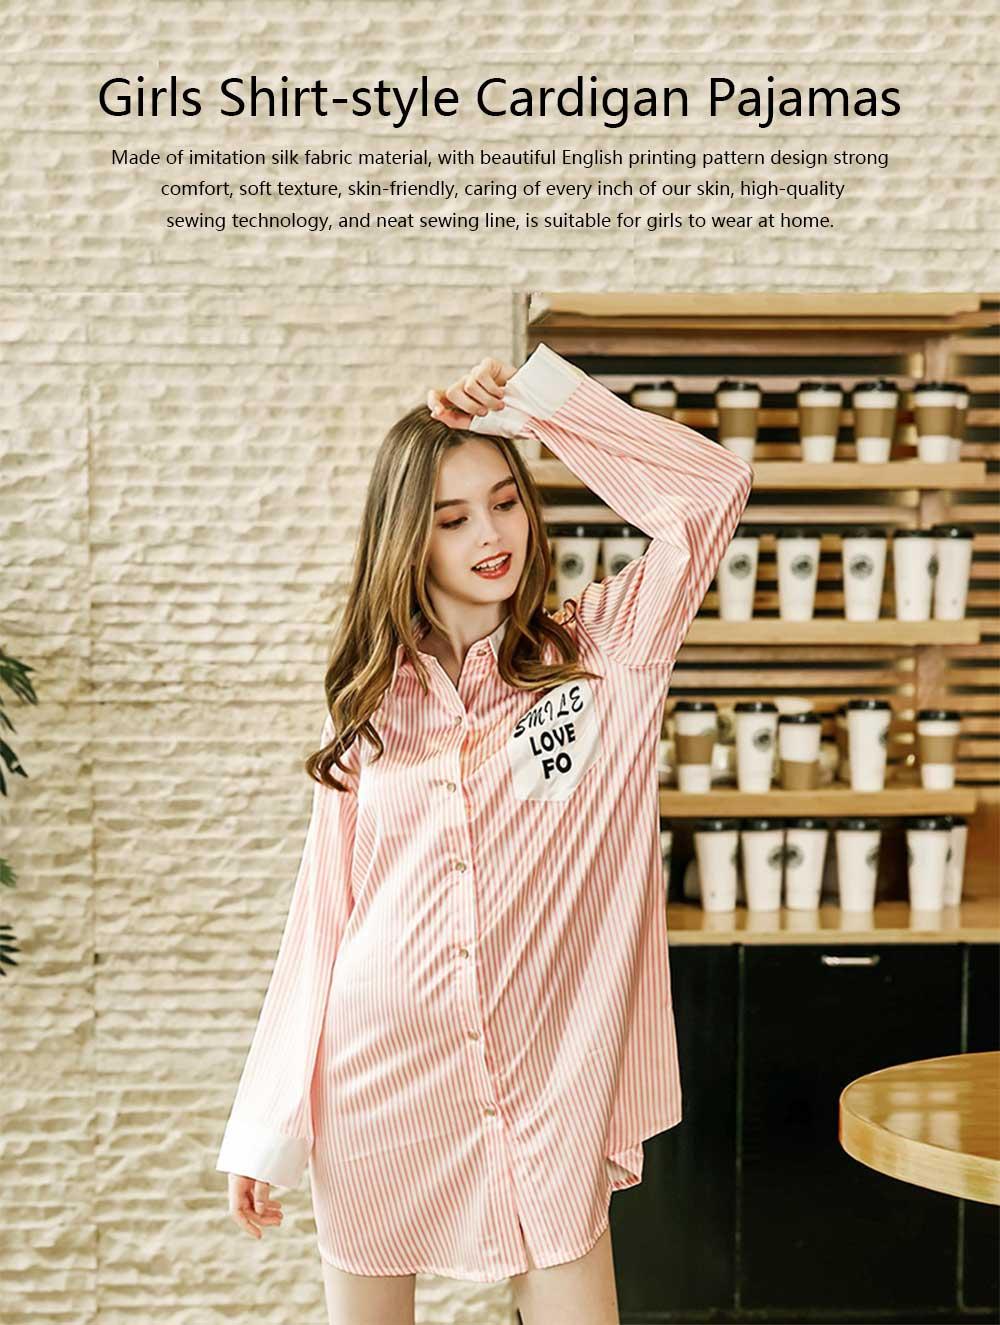 Girls Shirt-style Cardigan Pajamas, Long-Sleeved Imitation Silk Fabric Striped Tracksuit 0